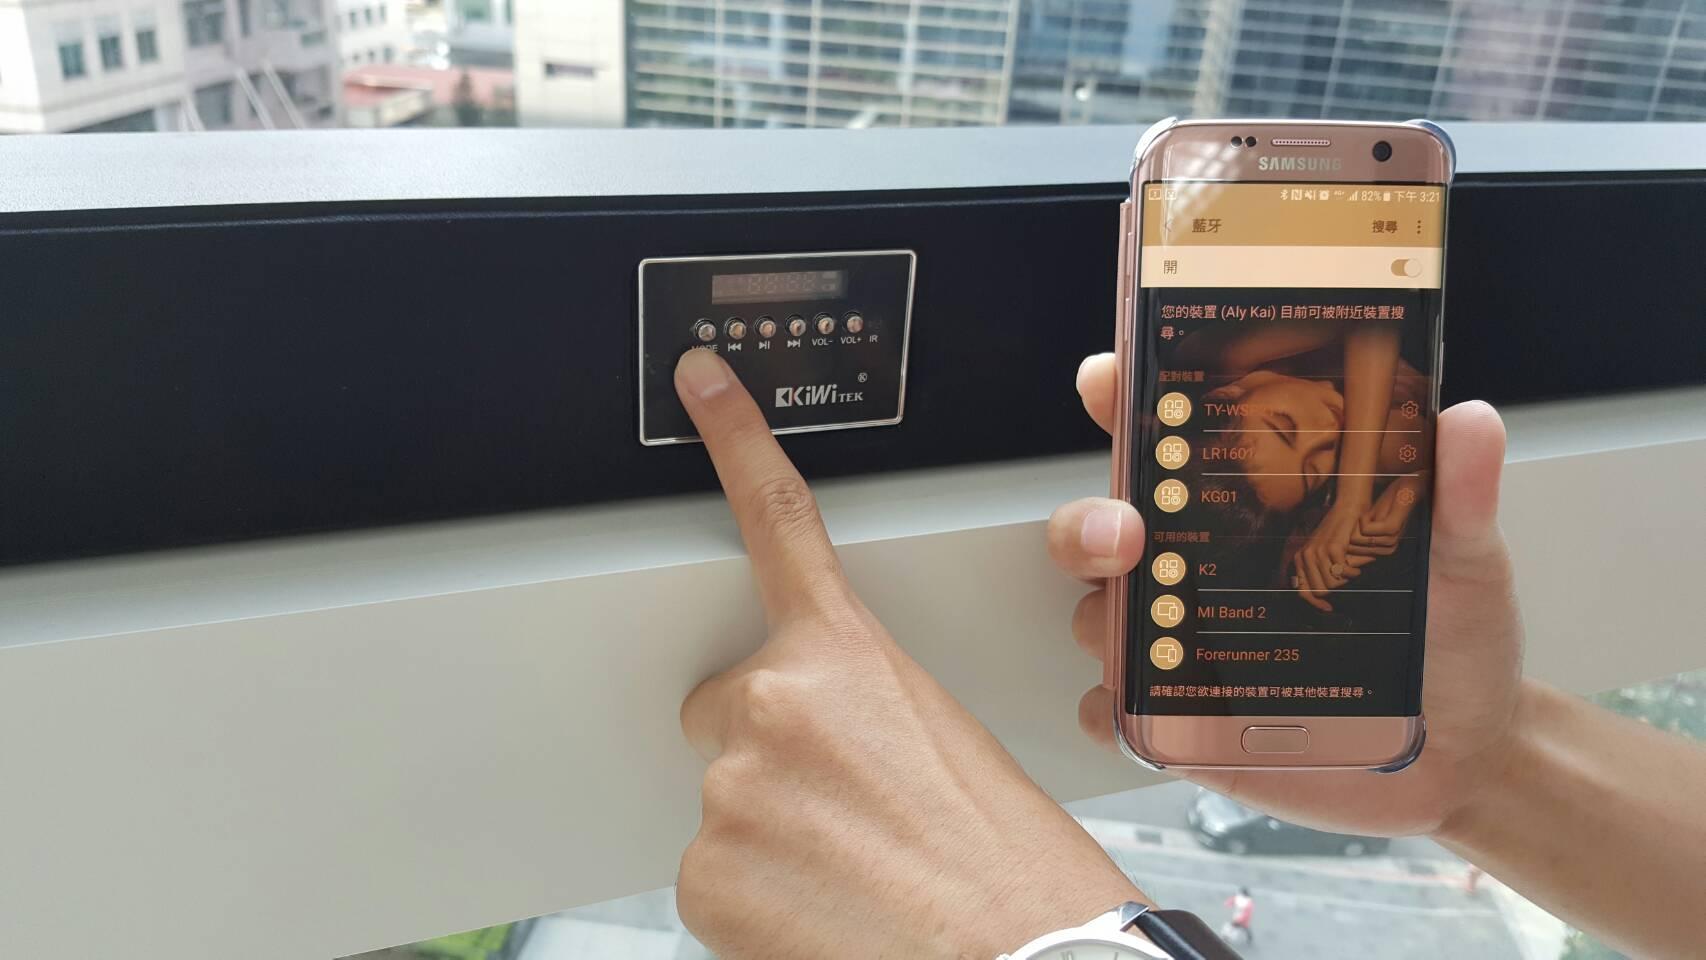 CP值超高免比價!!~【芒果科技】藍芽USB四單體無線重低音聲霸~!!